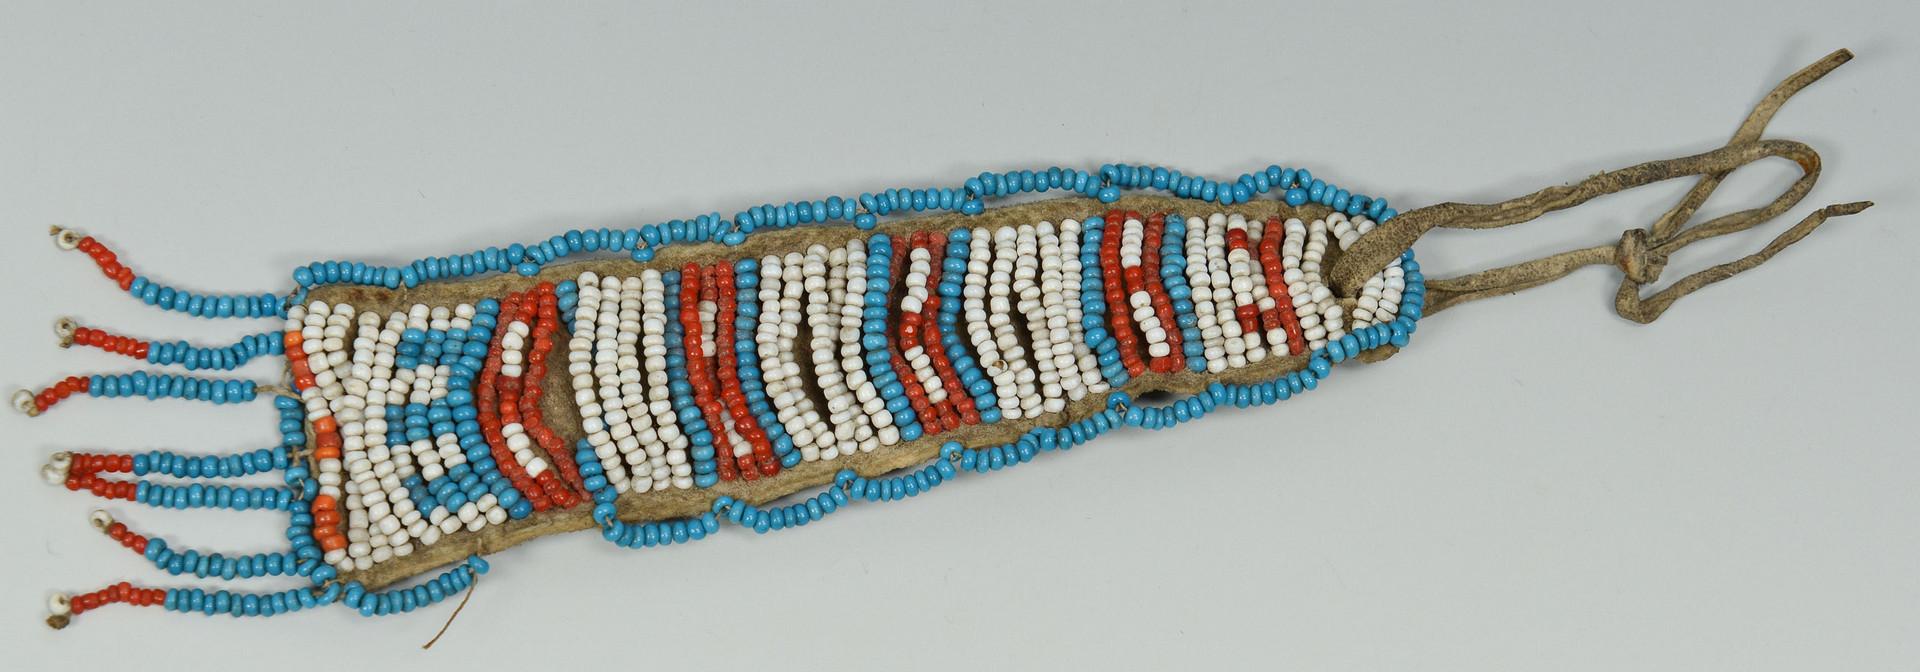 Lot 321: Plains Indian War Club, Sheaths